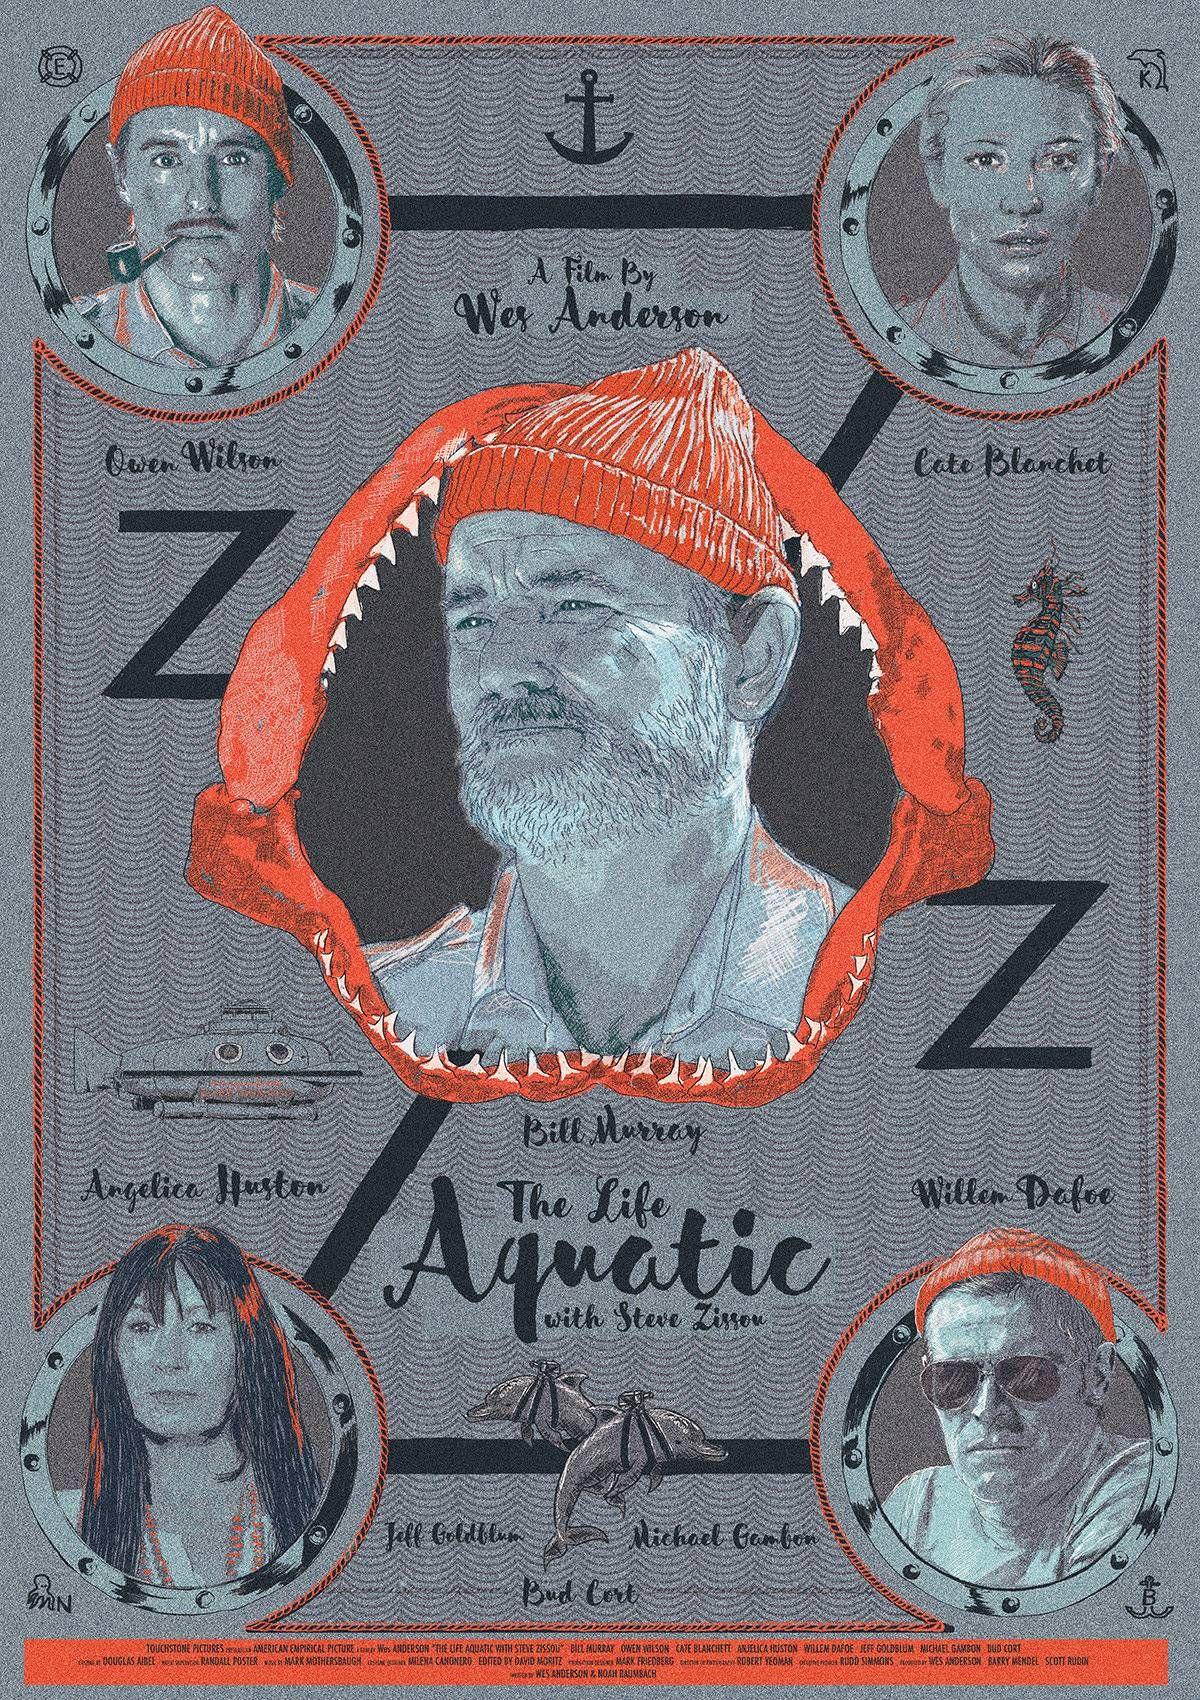 The Life Aquatic with Steve Zissou 2004 HD Wallpaper From 1200x1700